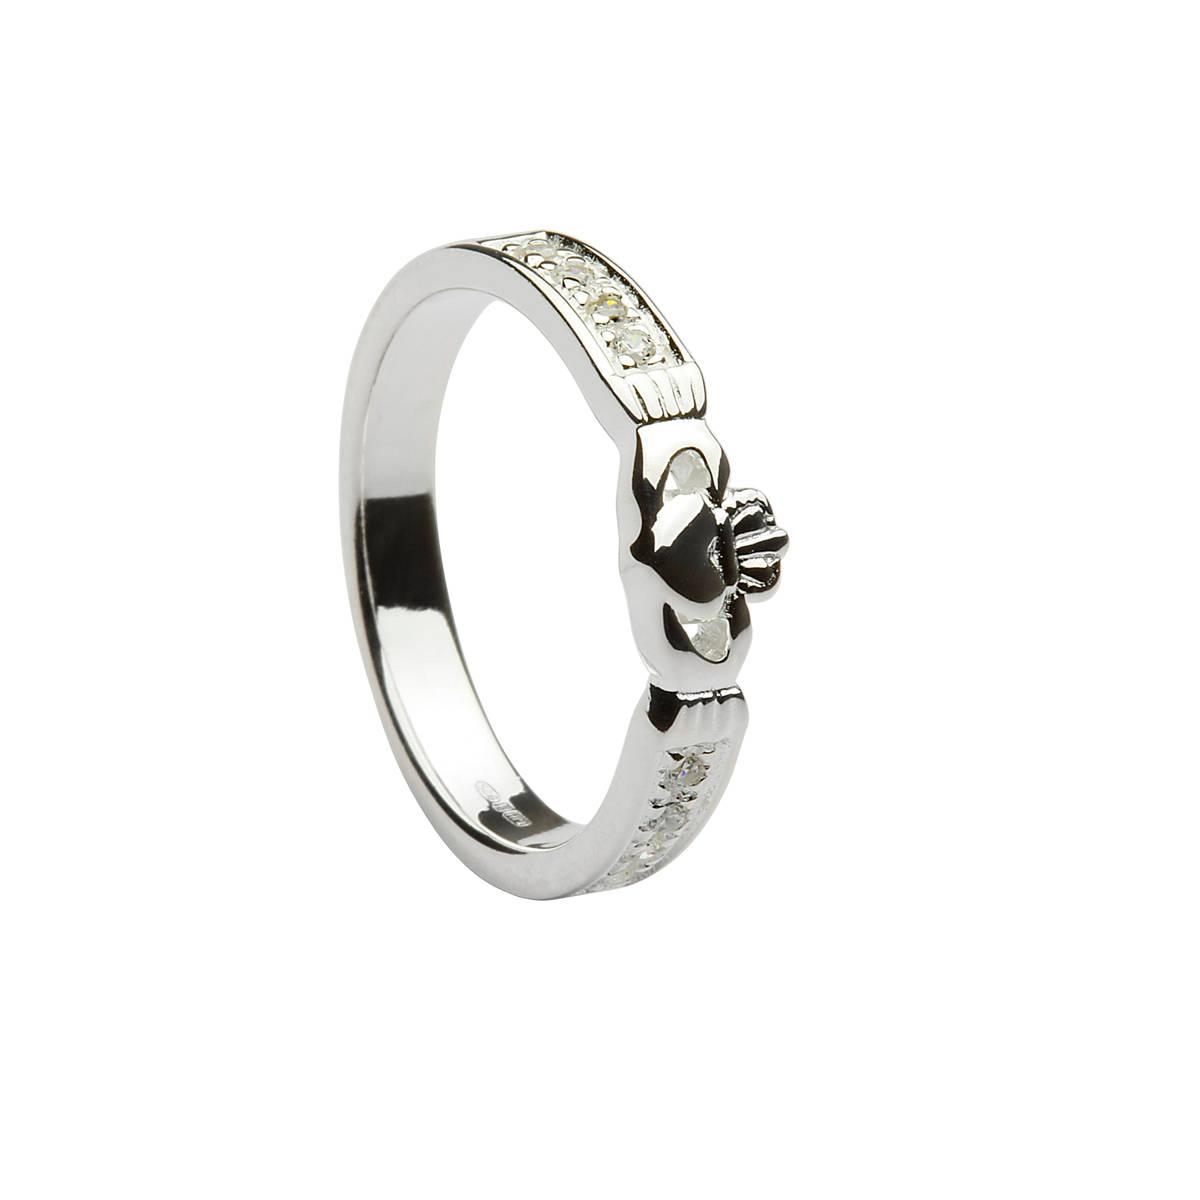 Silver CZ set Claddagh ring.Most unusual style.